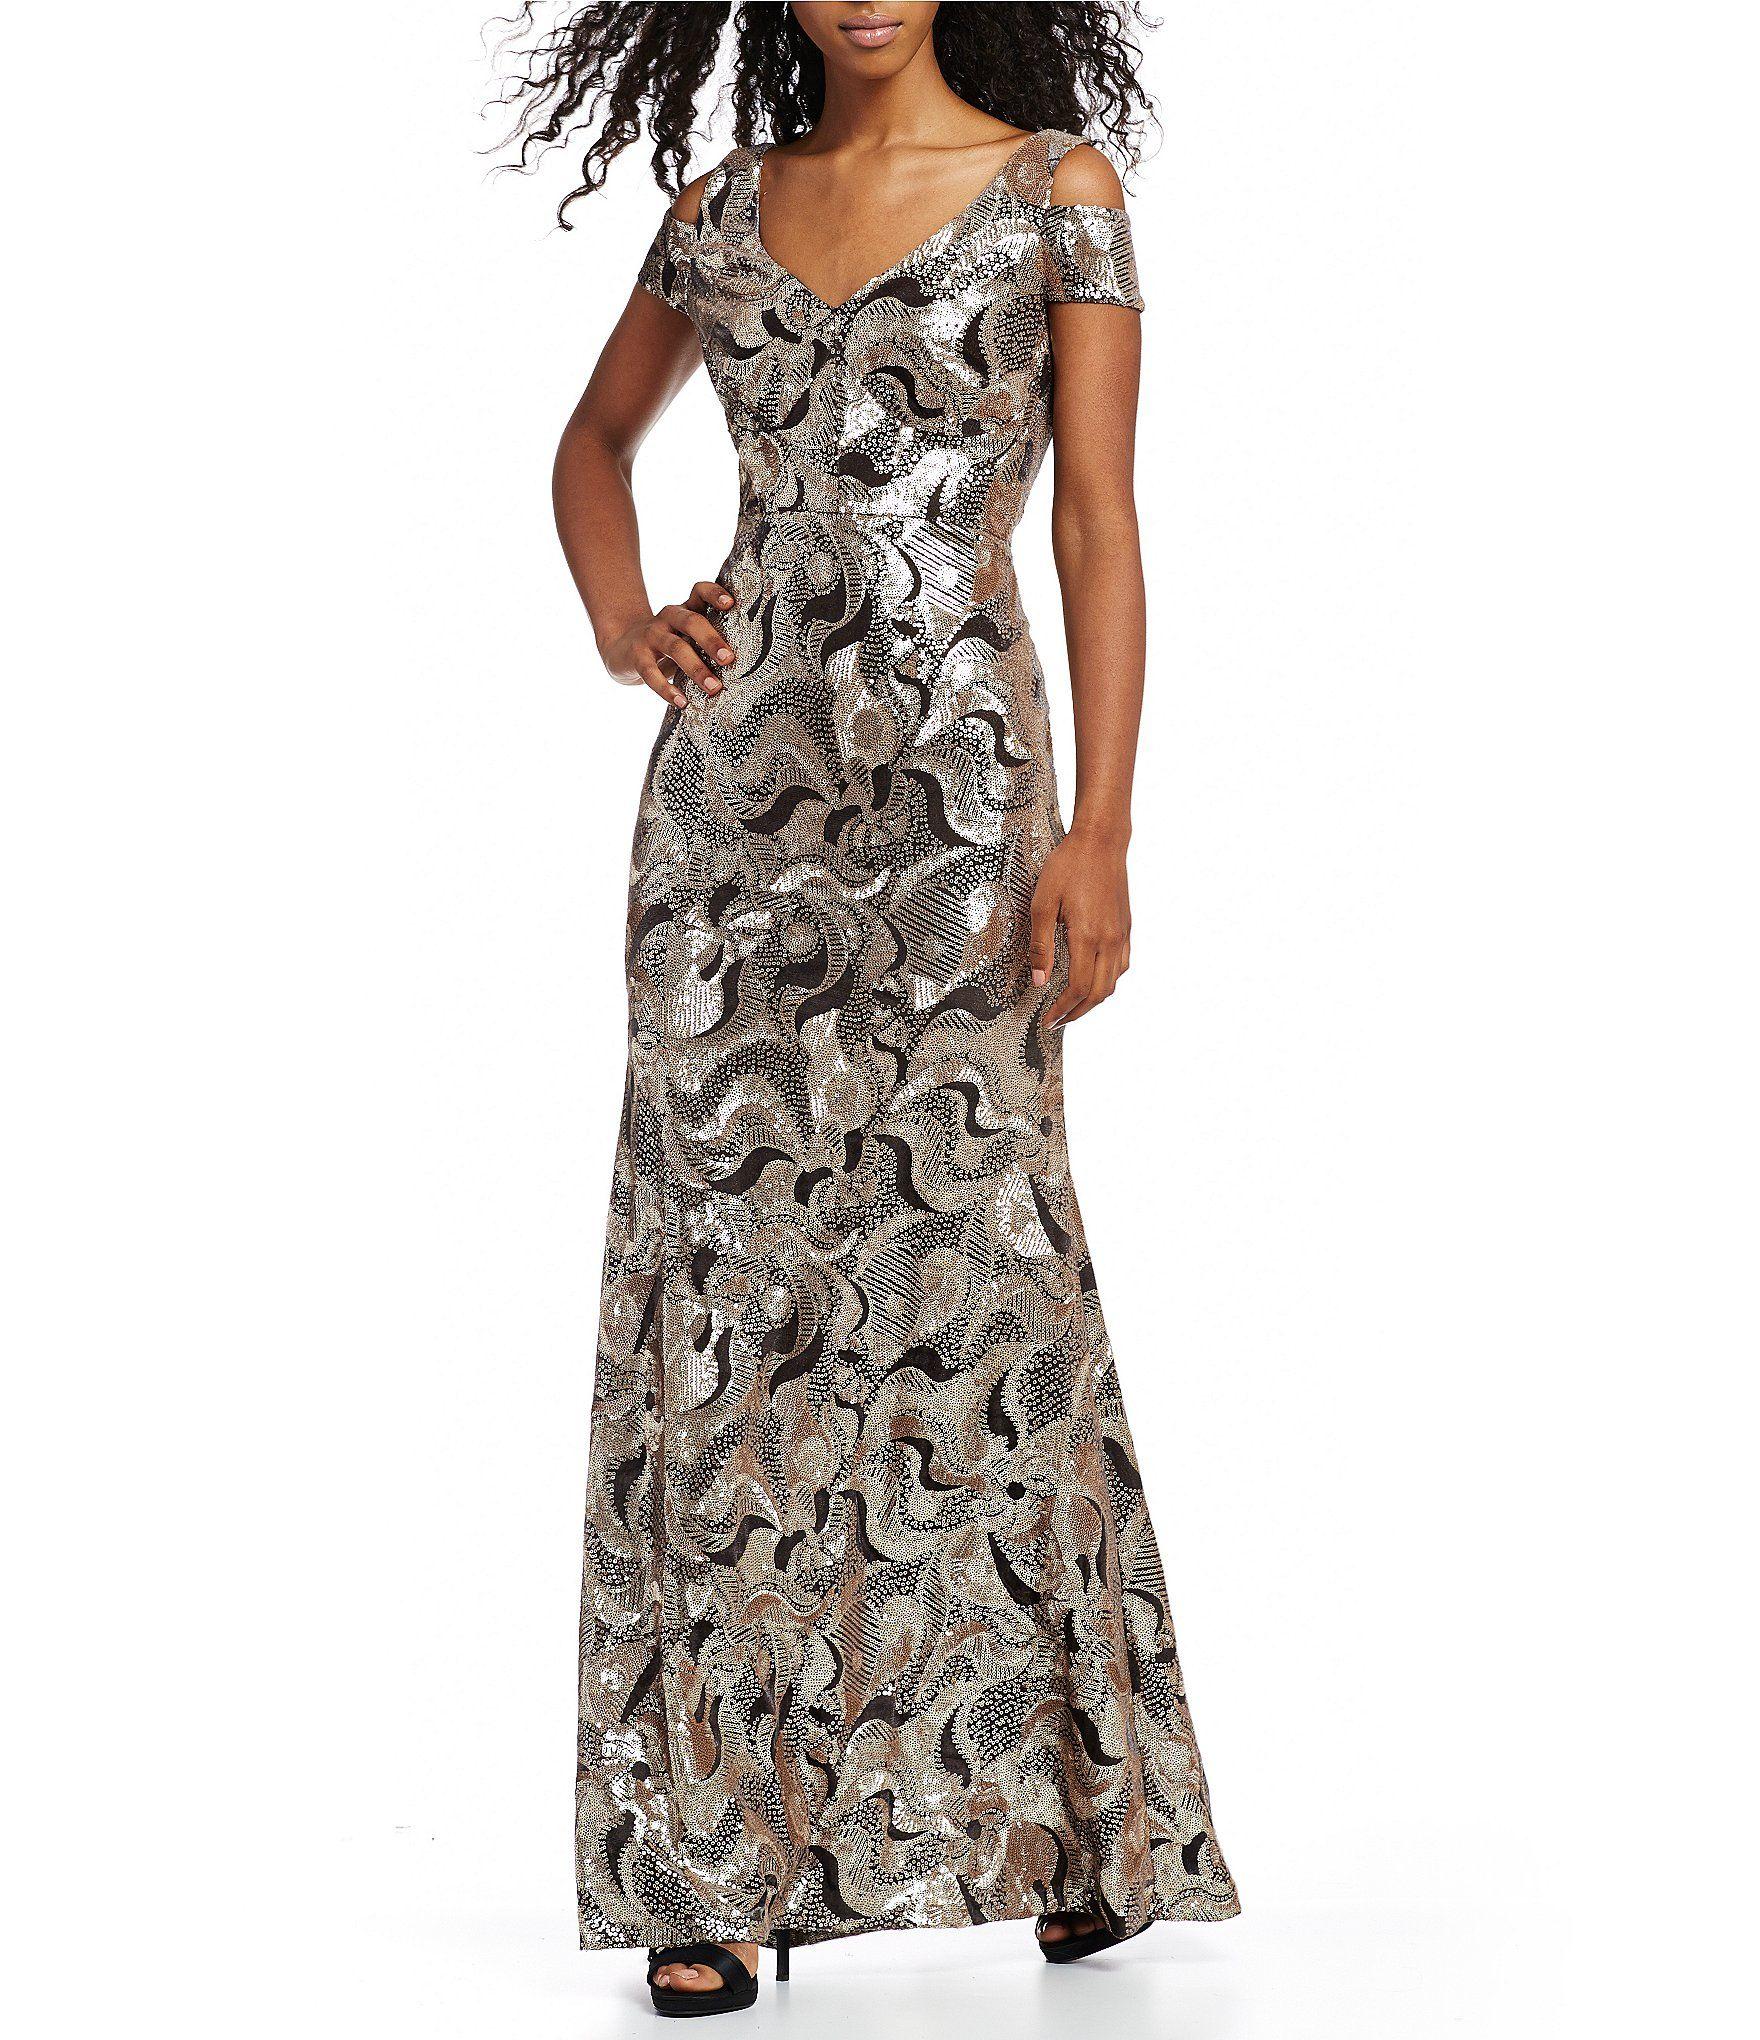 c992d6678de Calvin Klein Evening Dresses Dillards - Gomes Weine AG